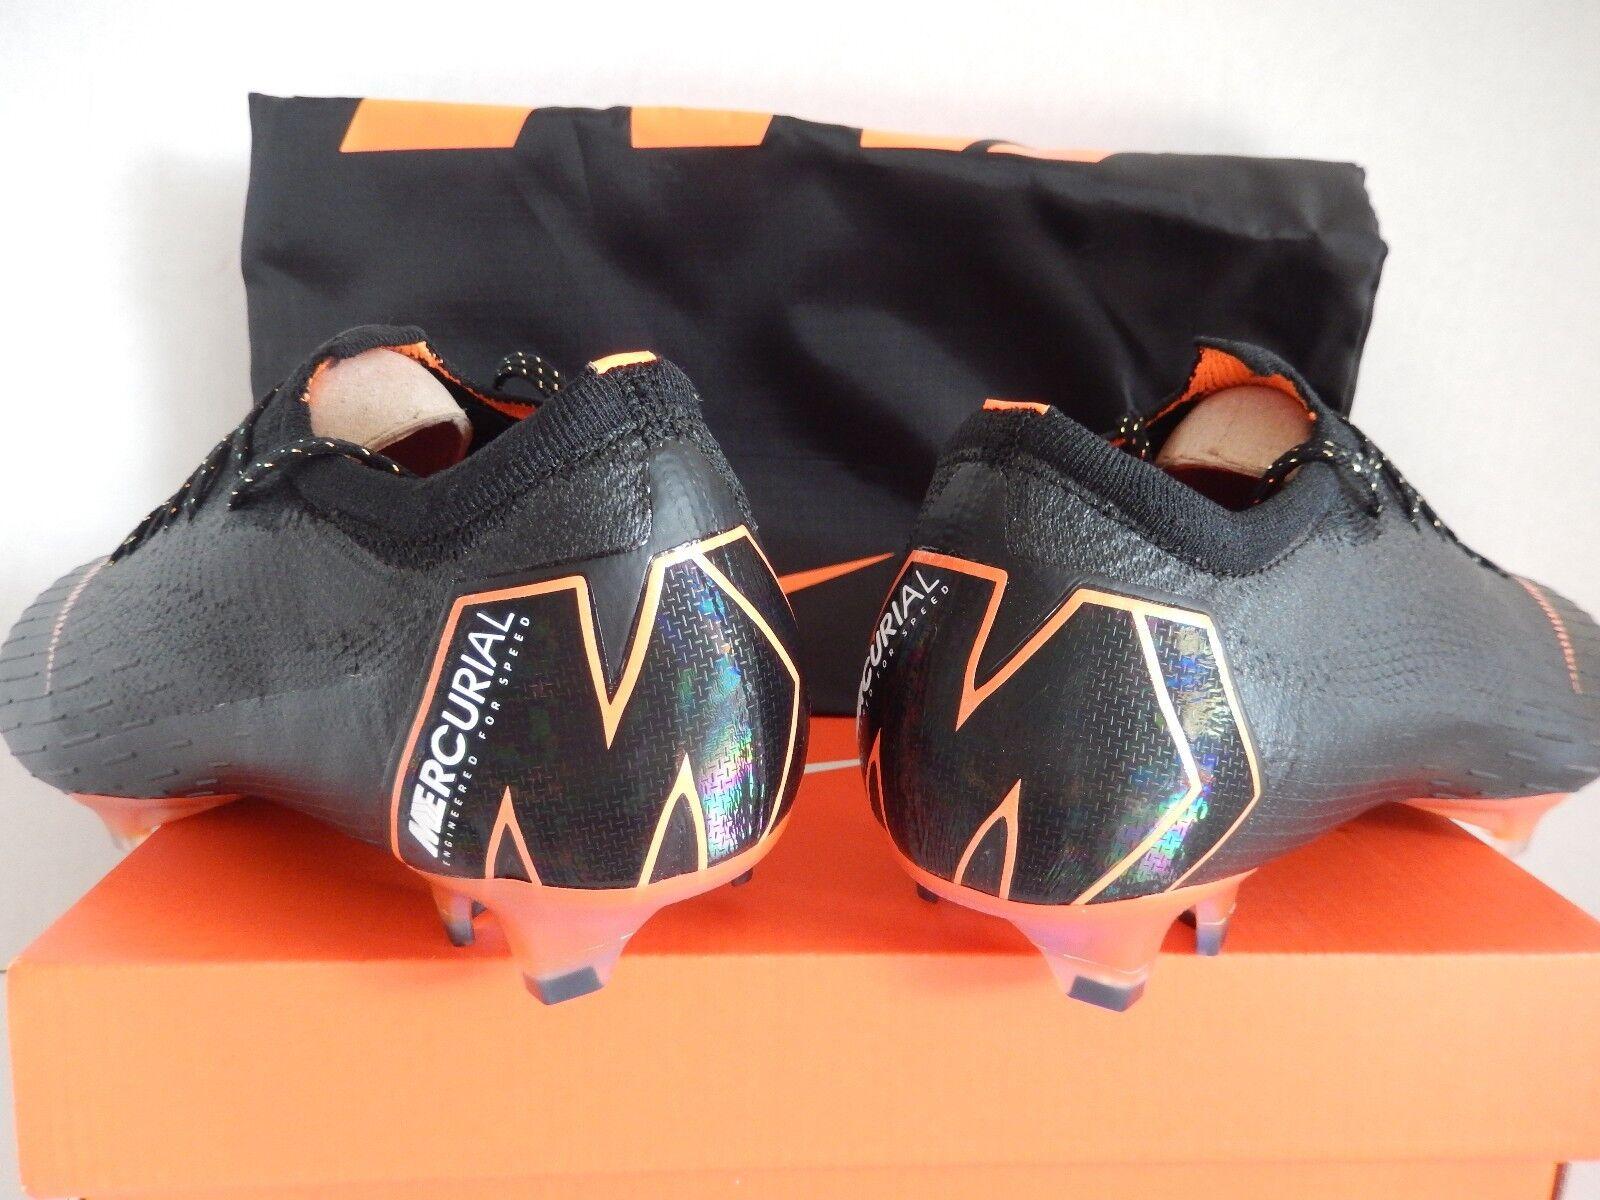 nike vapor 12 sz elite fg black-total orange-white sz 12 7 [ah7380-081] 868e66